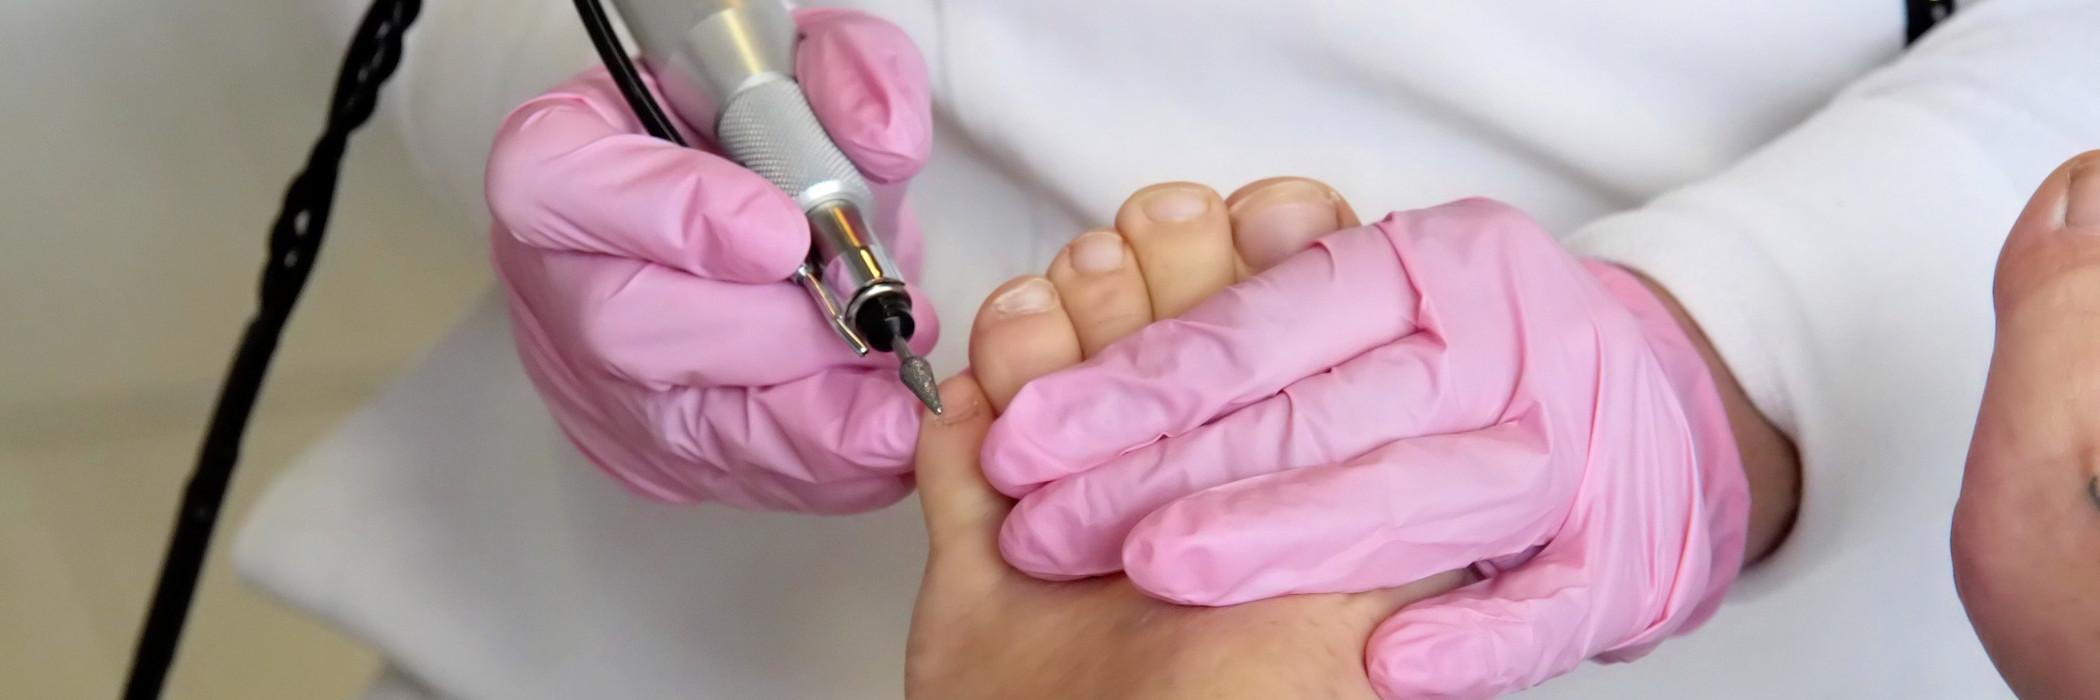 Pedicure en medische pedicure